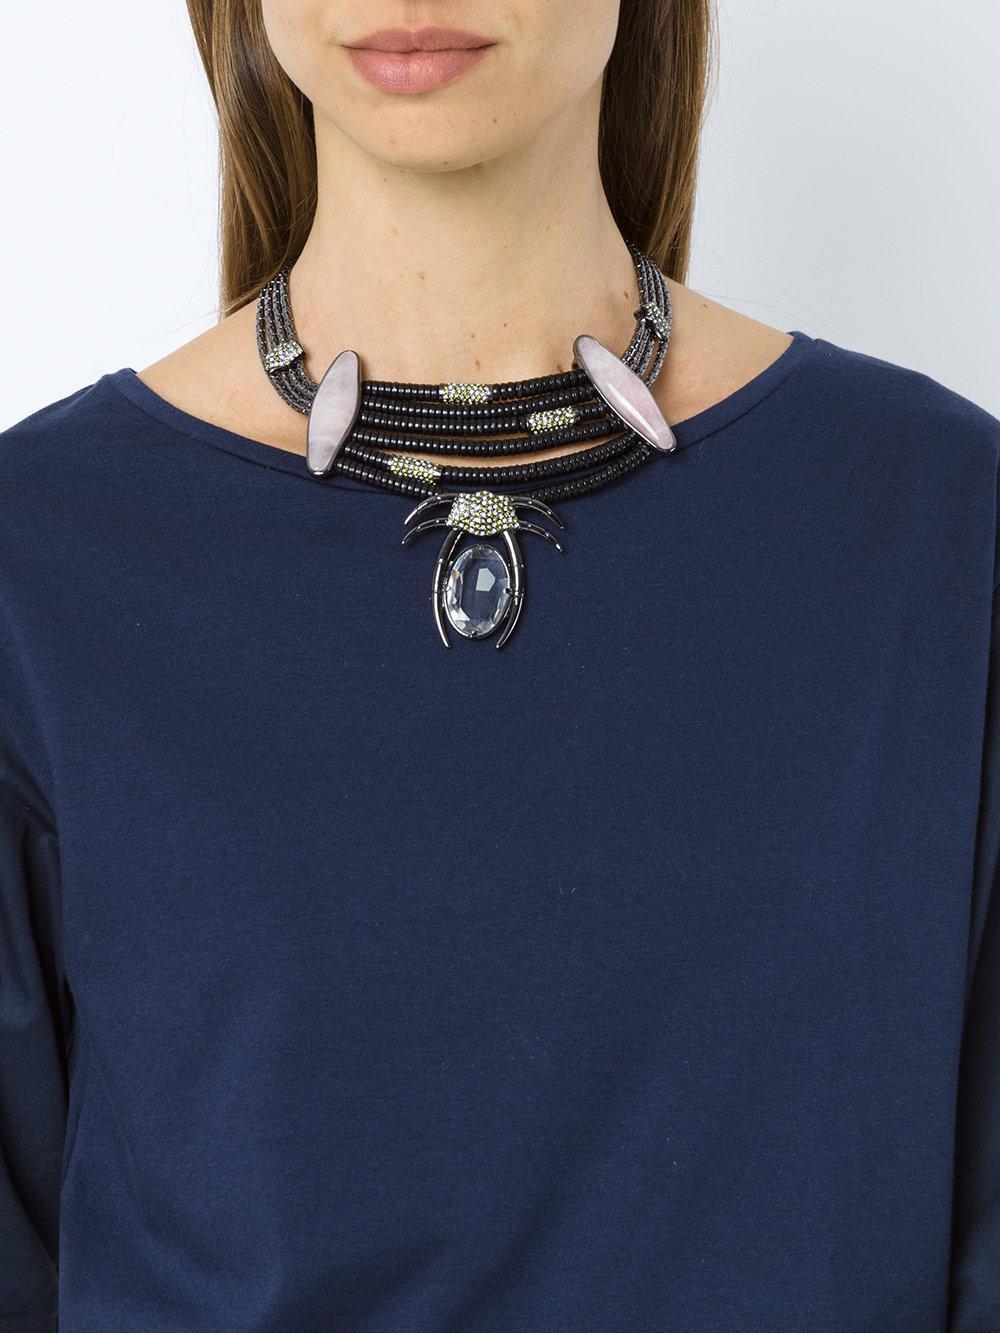 Camila Klein Millipede Necklace in Metallic